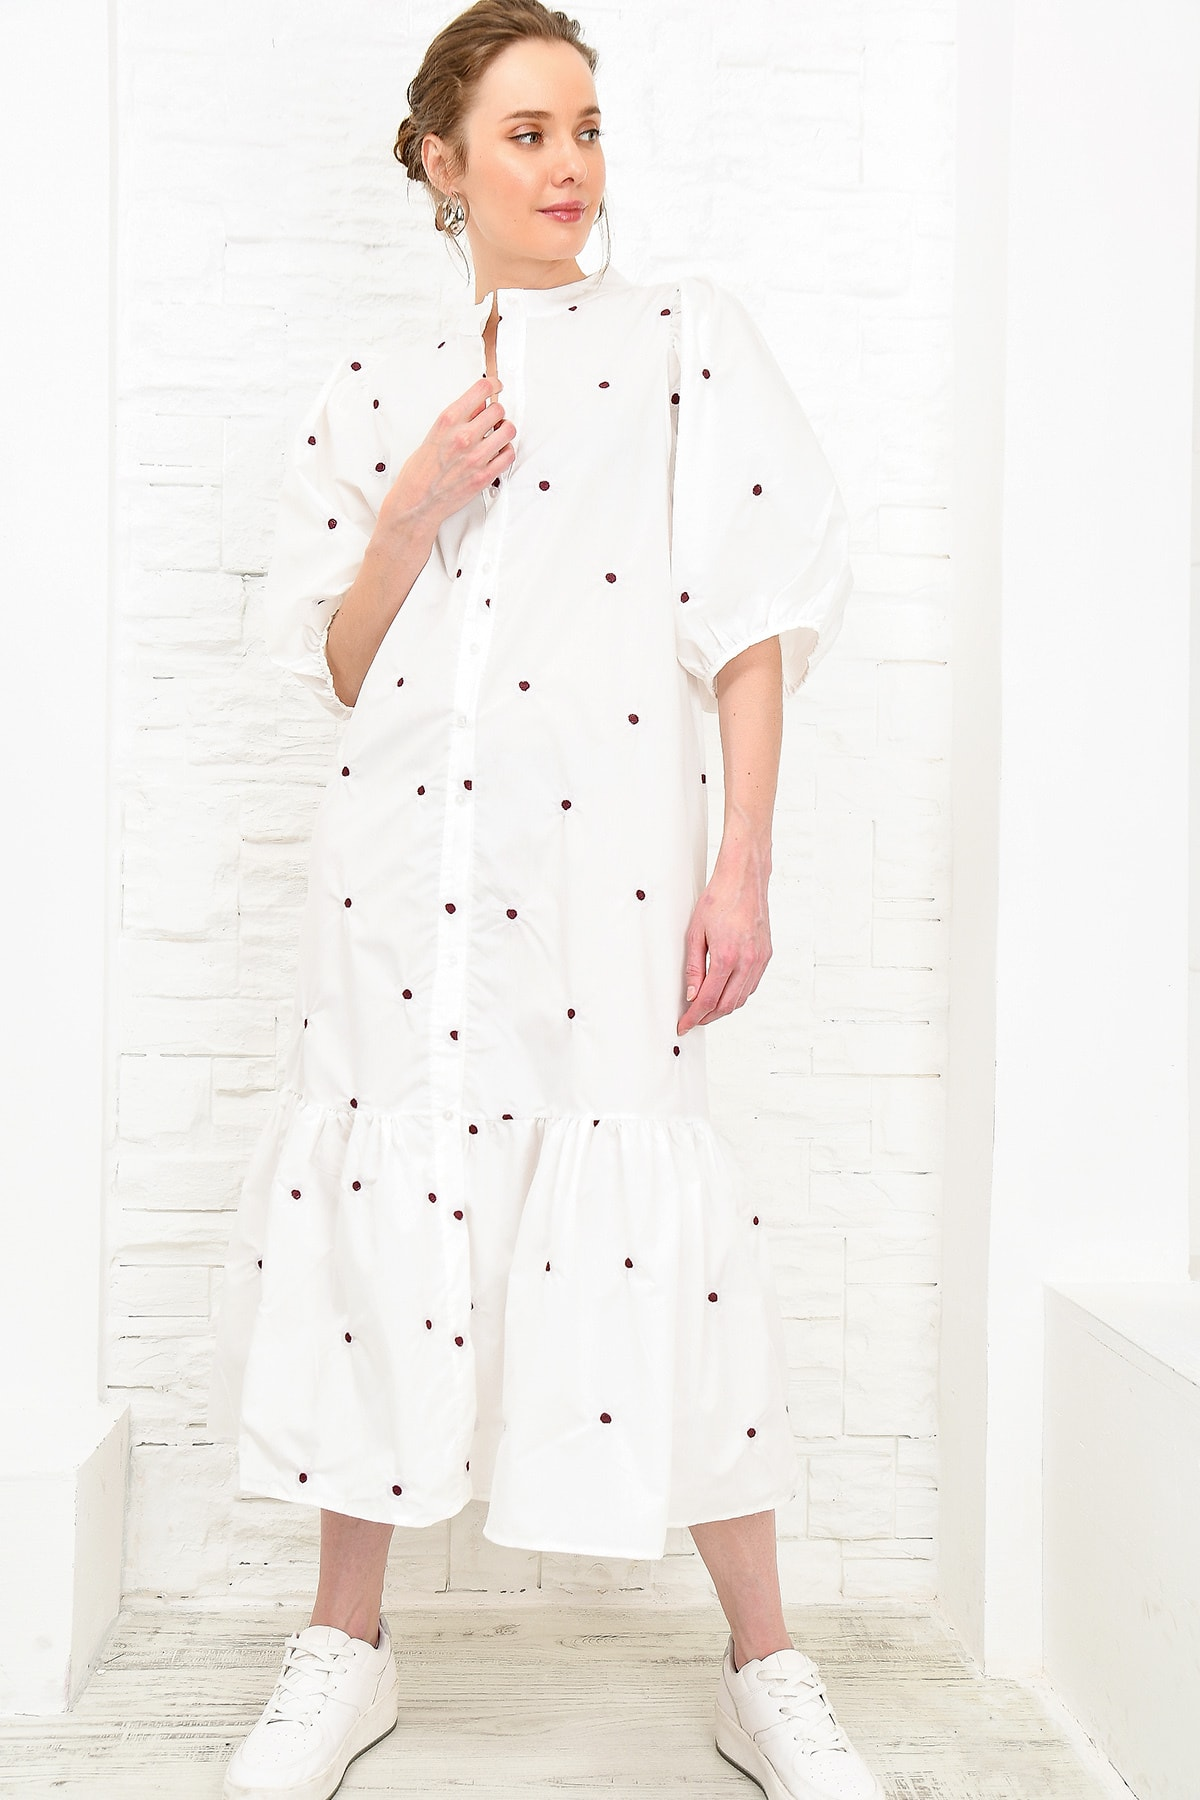 Tendencia Alacati estilo bordado Poplın vestido de camisa ALC-X4093